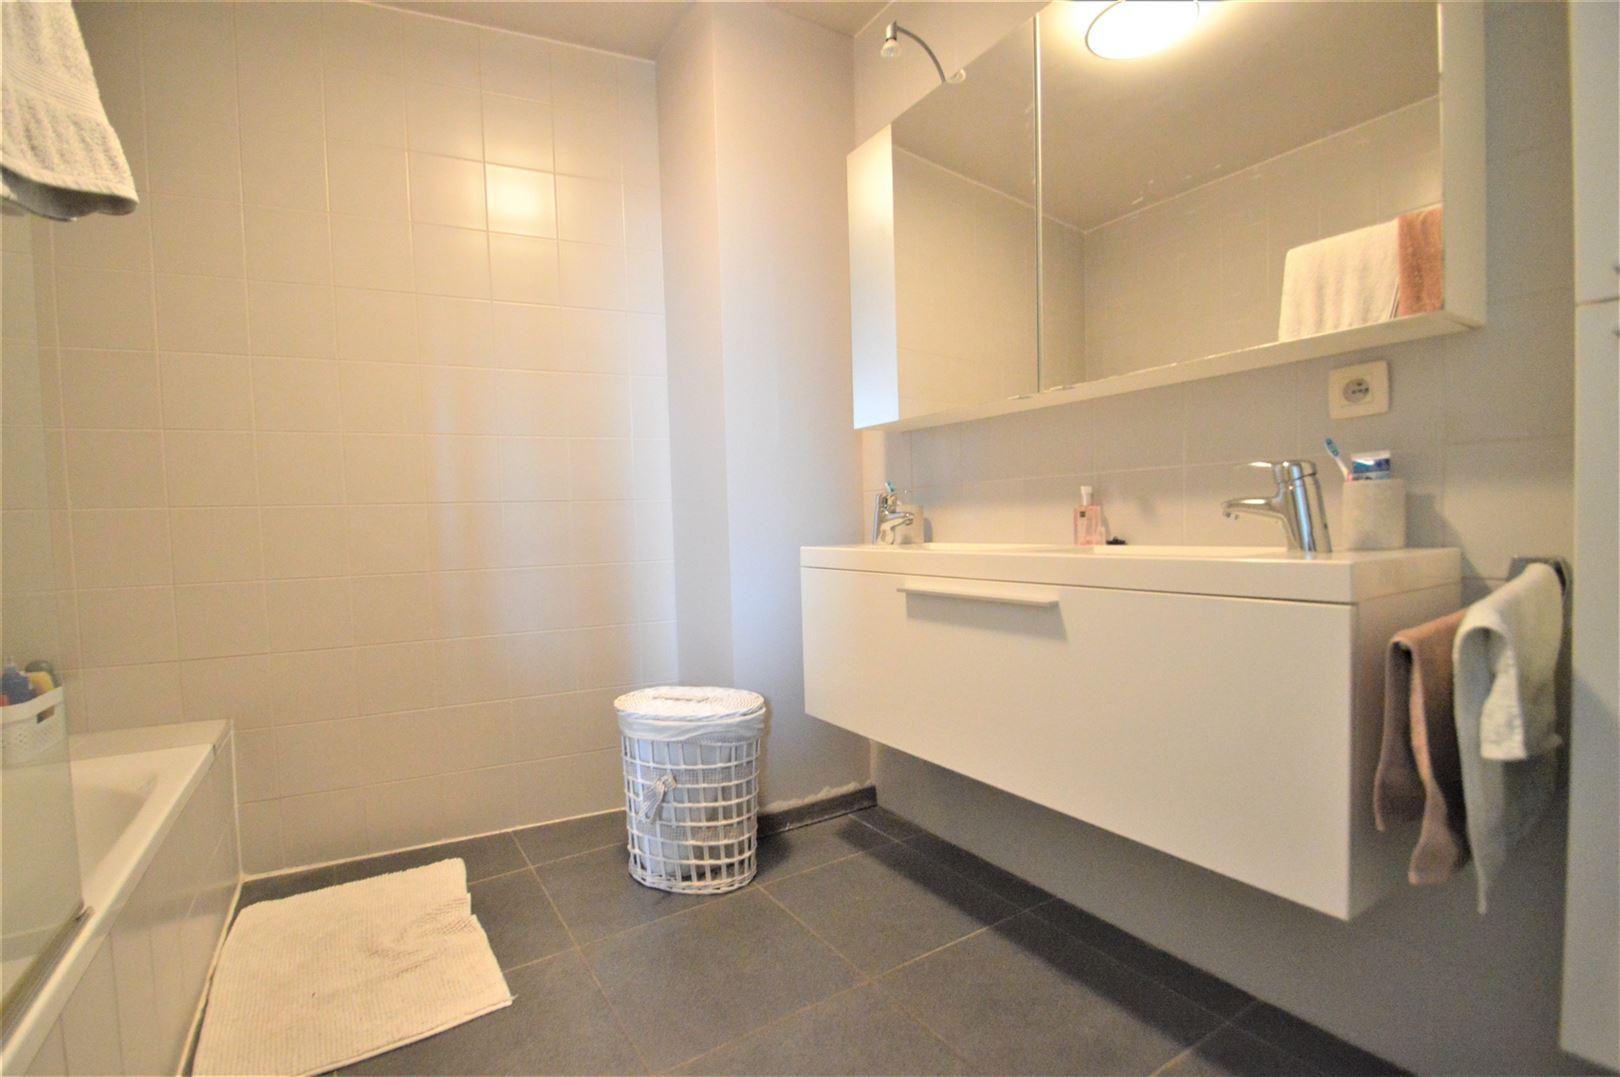 Foto 6 : Appartement te 9200 BAASRODE (België) - Prijs € 750